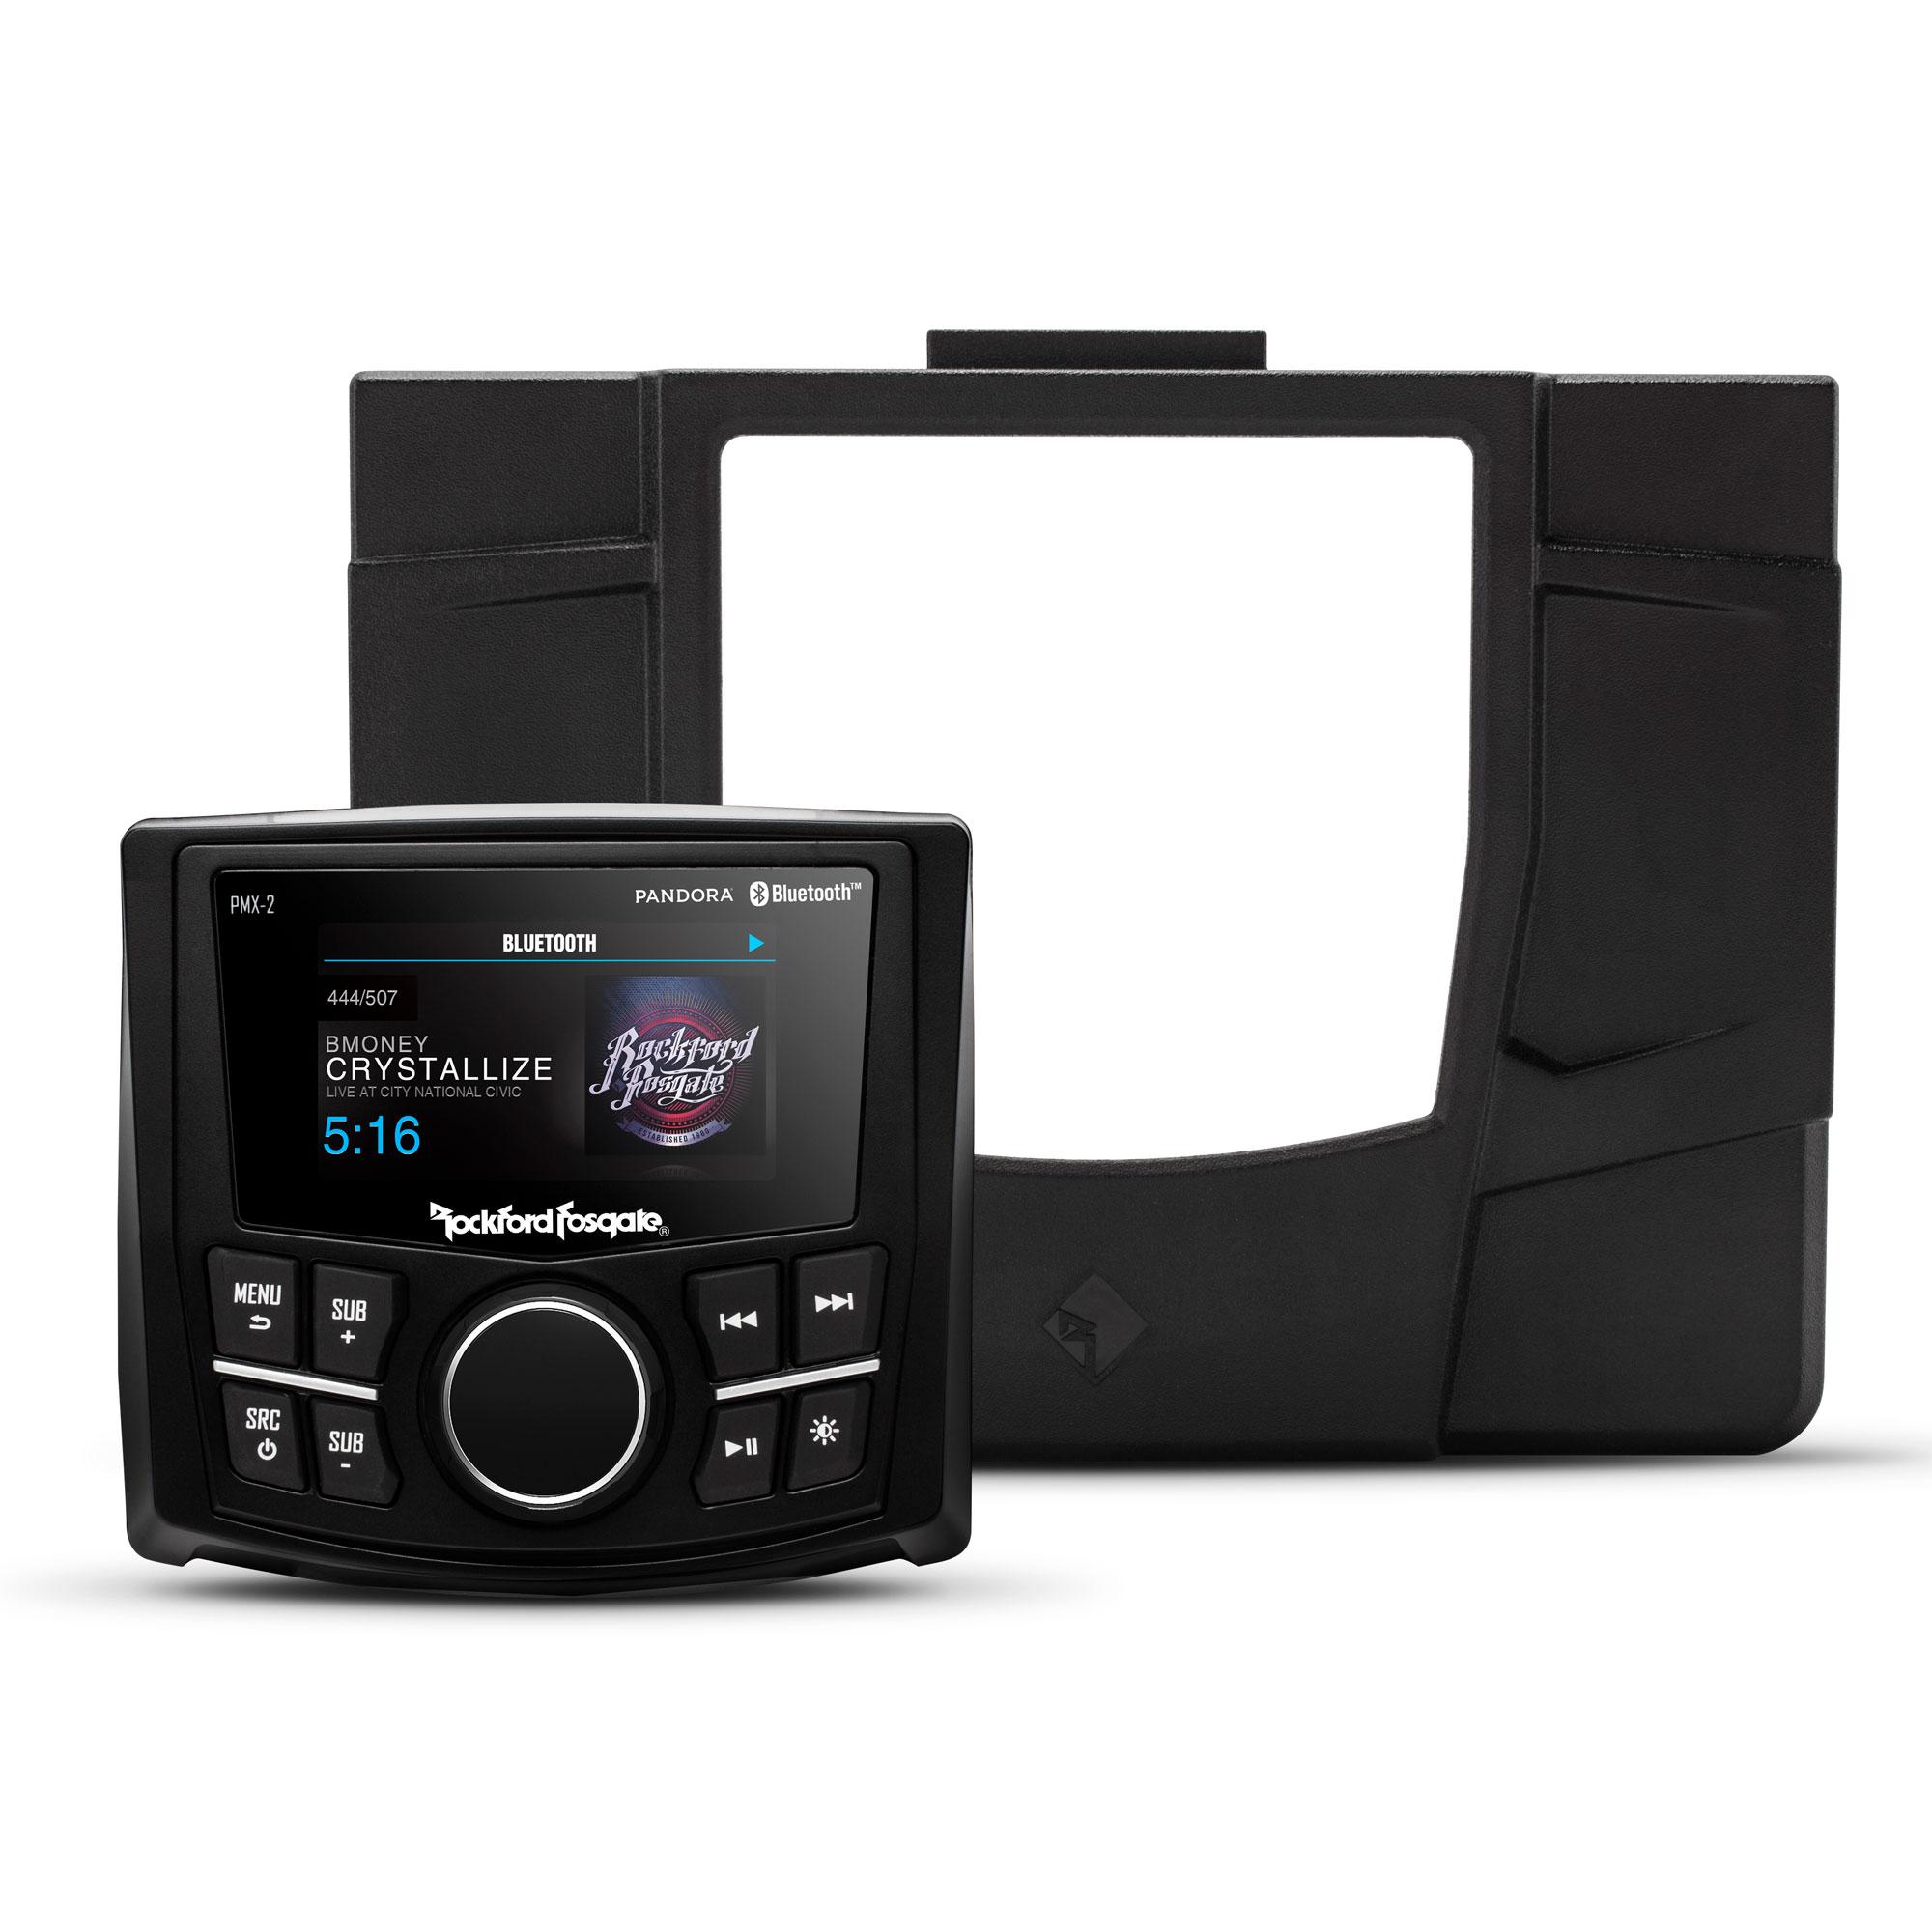 Details about Rockford Fosgate Stereo Kit for Select Polaris RZR Models,  PMX-2 & Dash Kit